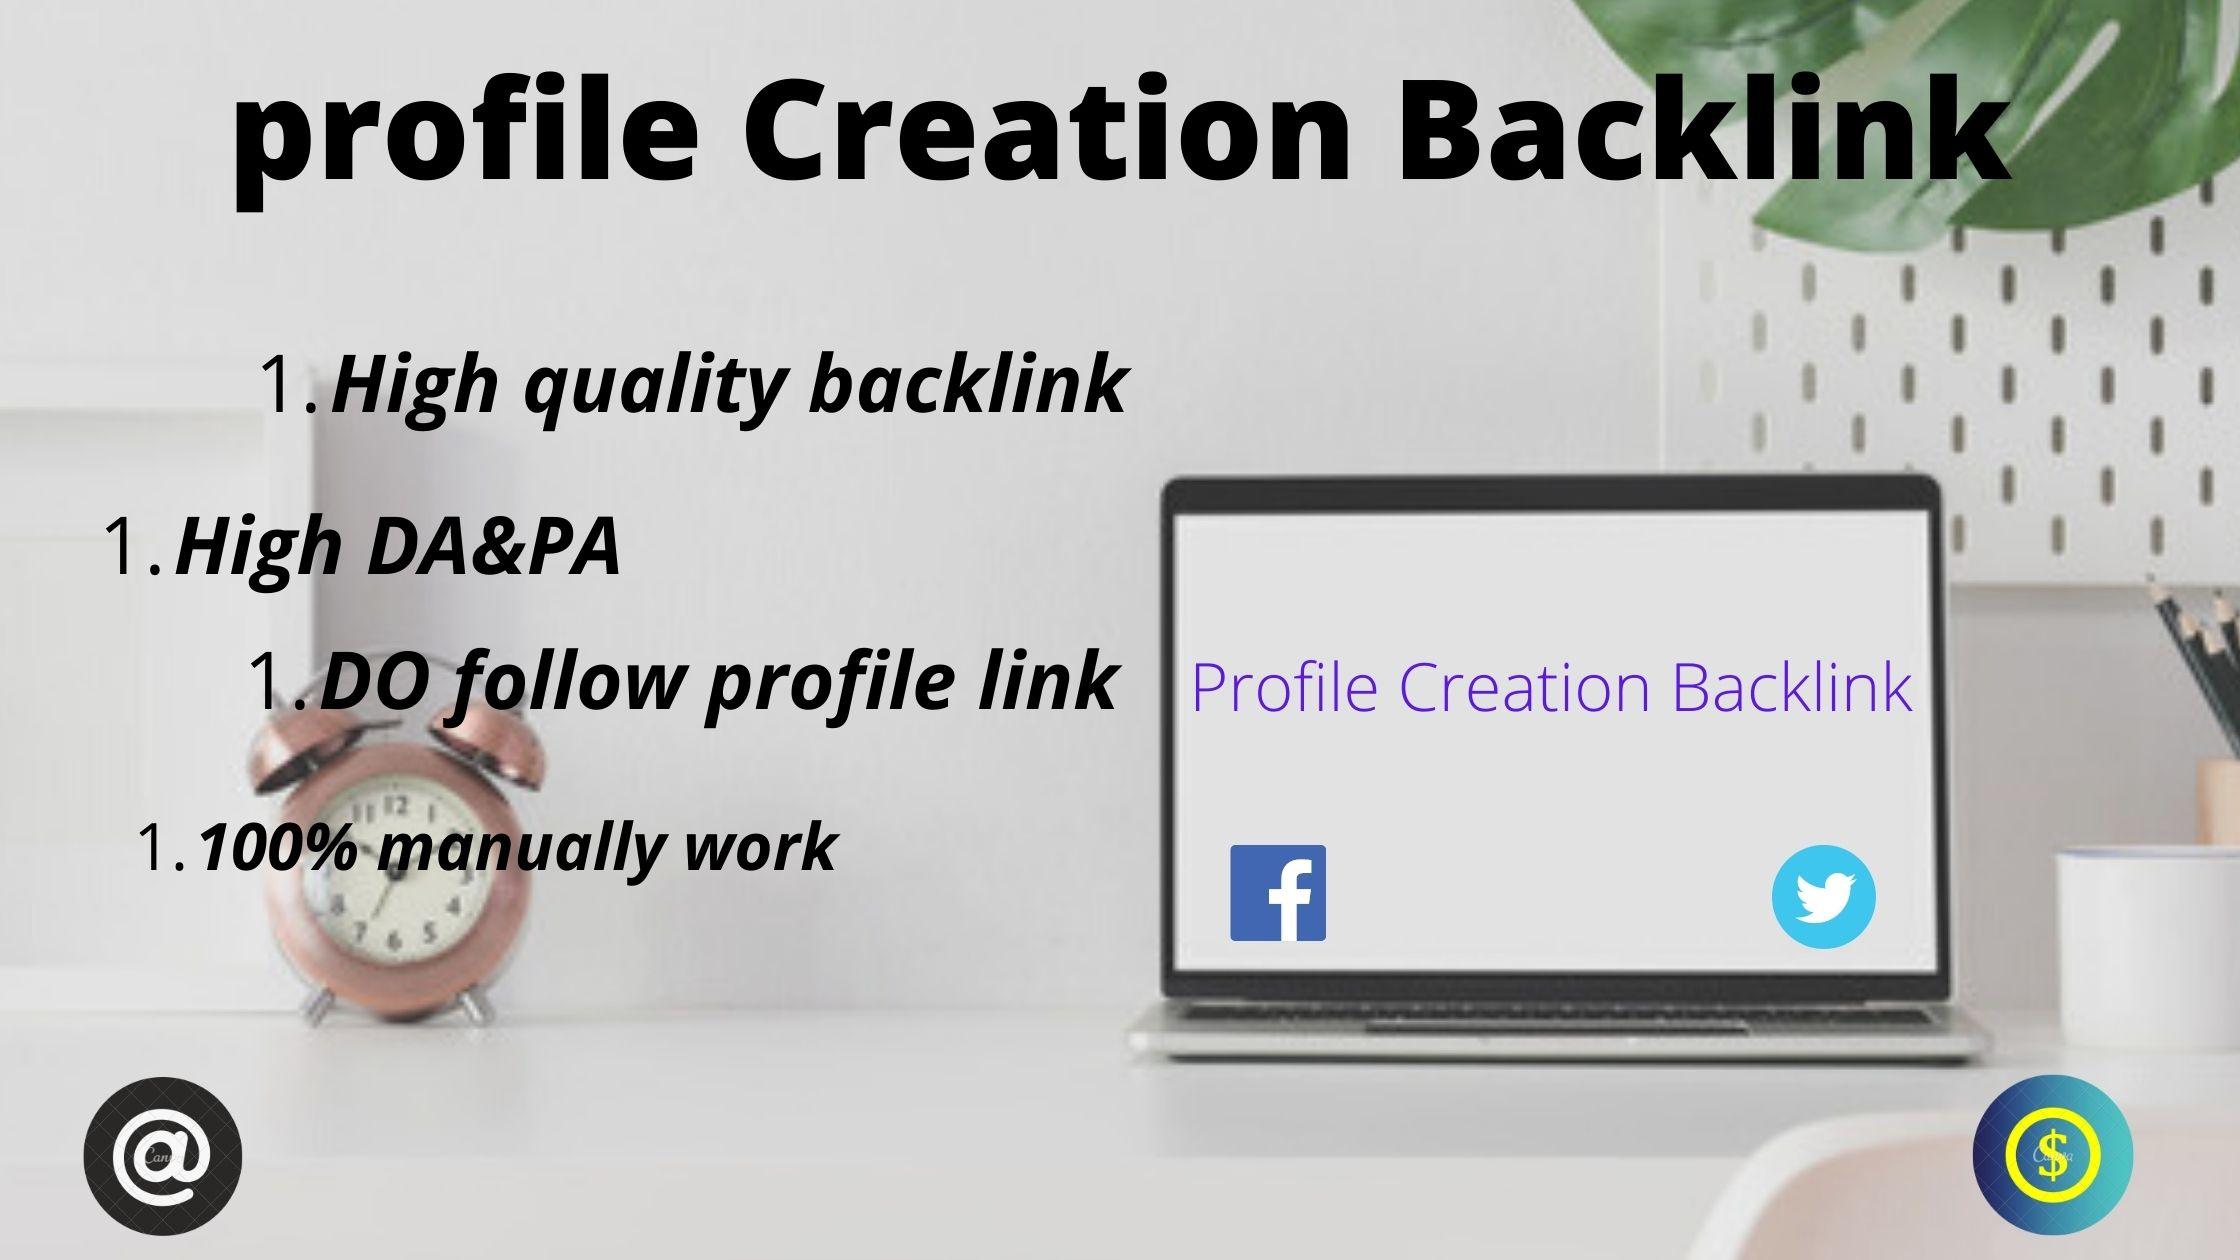 I will do 30 profile creation backlinks